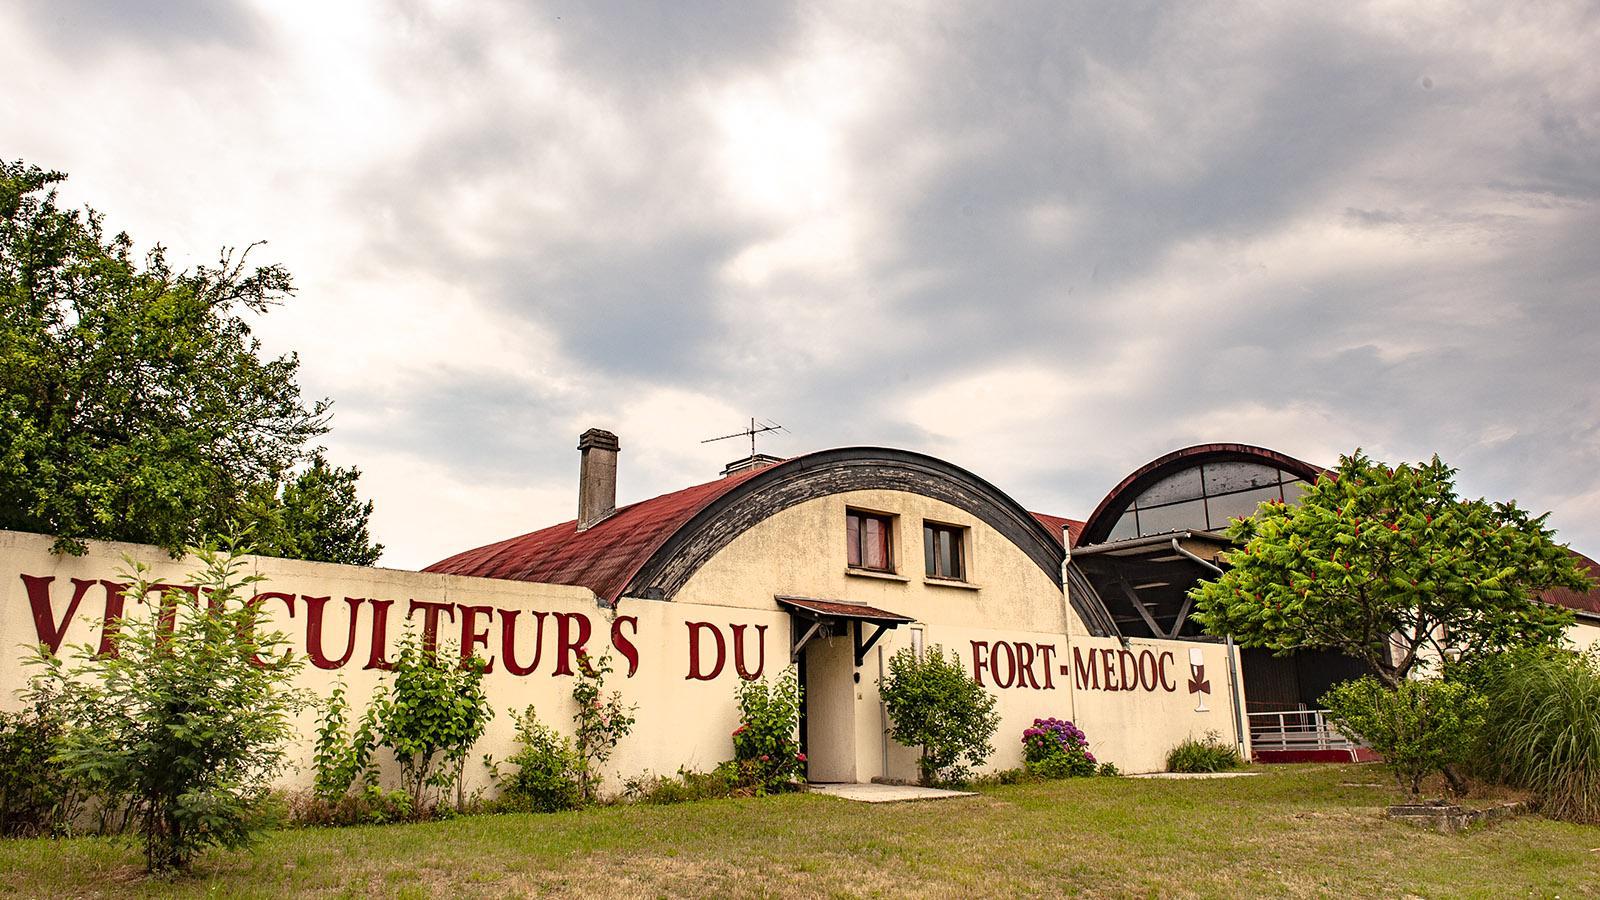 Médoc: Viticulteurs Fort-Médoc. Foto: Hilke Maunder